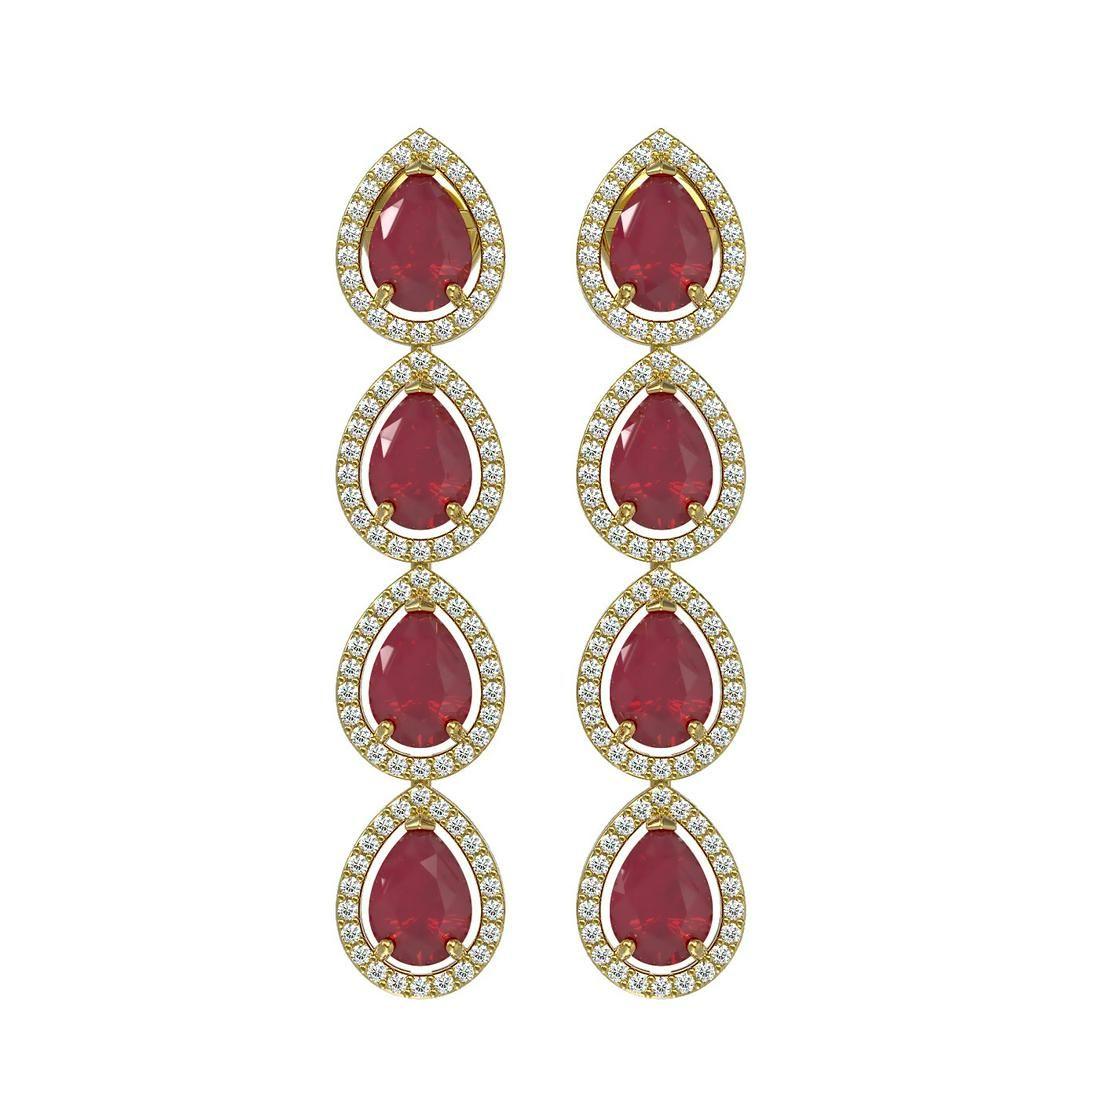 10.2 ctw Ruby & Diamond Micro Pave Halo Earrings 10k